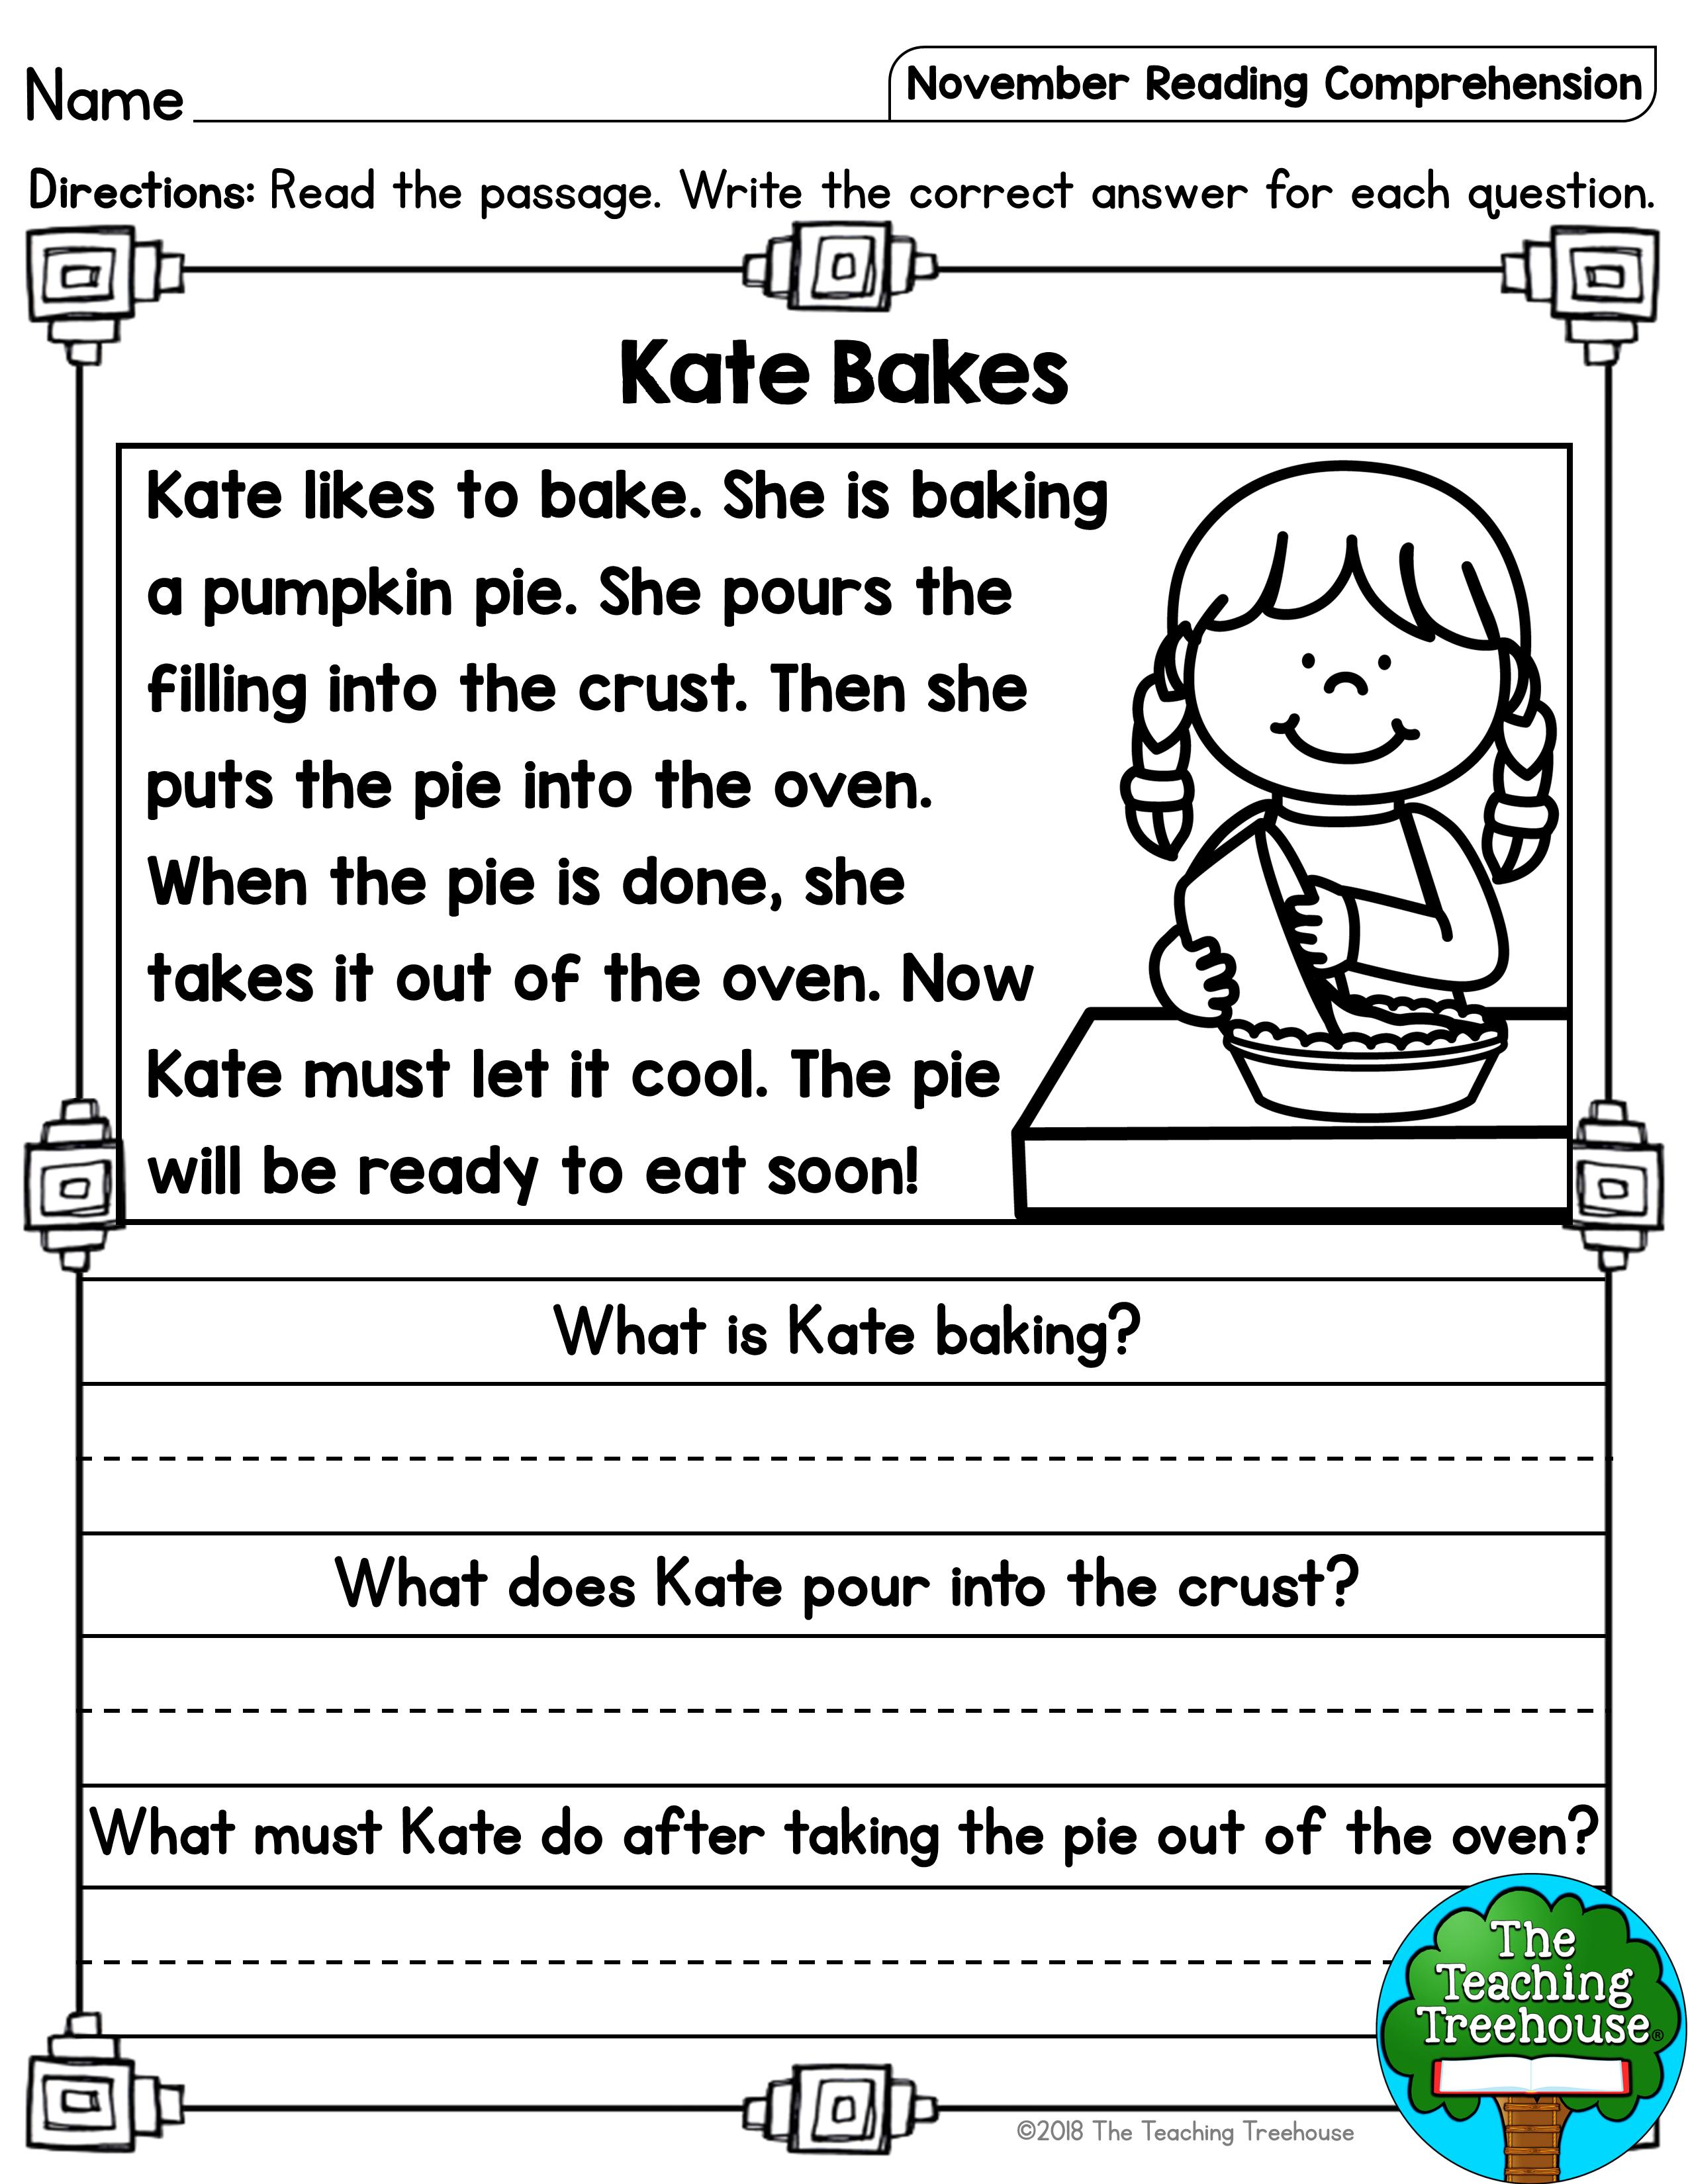 November Reading Comprehension Passages For Kindergarten And First Grade Reading Comprehension Reading Fluency Passages First Grade Reading Comprehension [ 3300 x 2550 Pixel ]